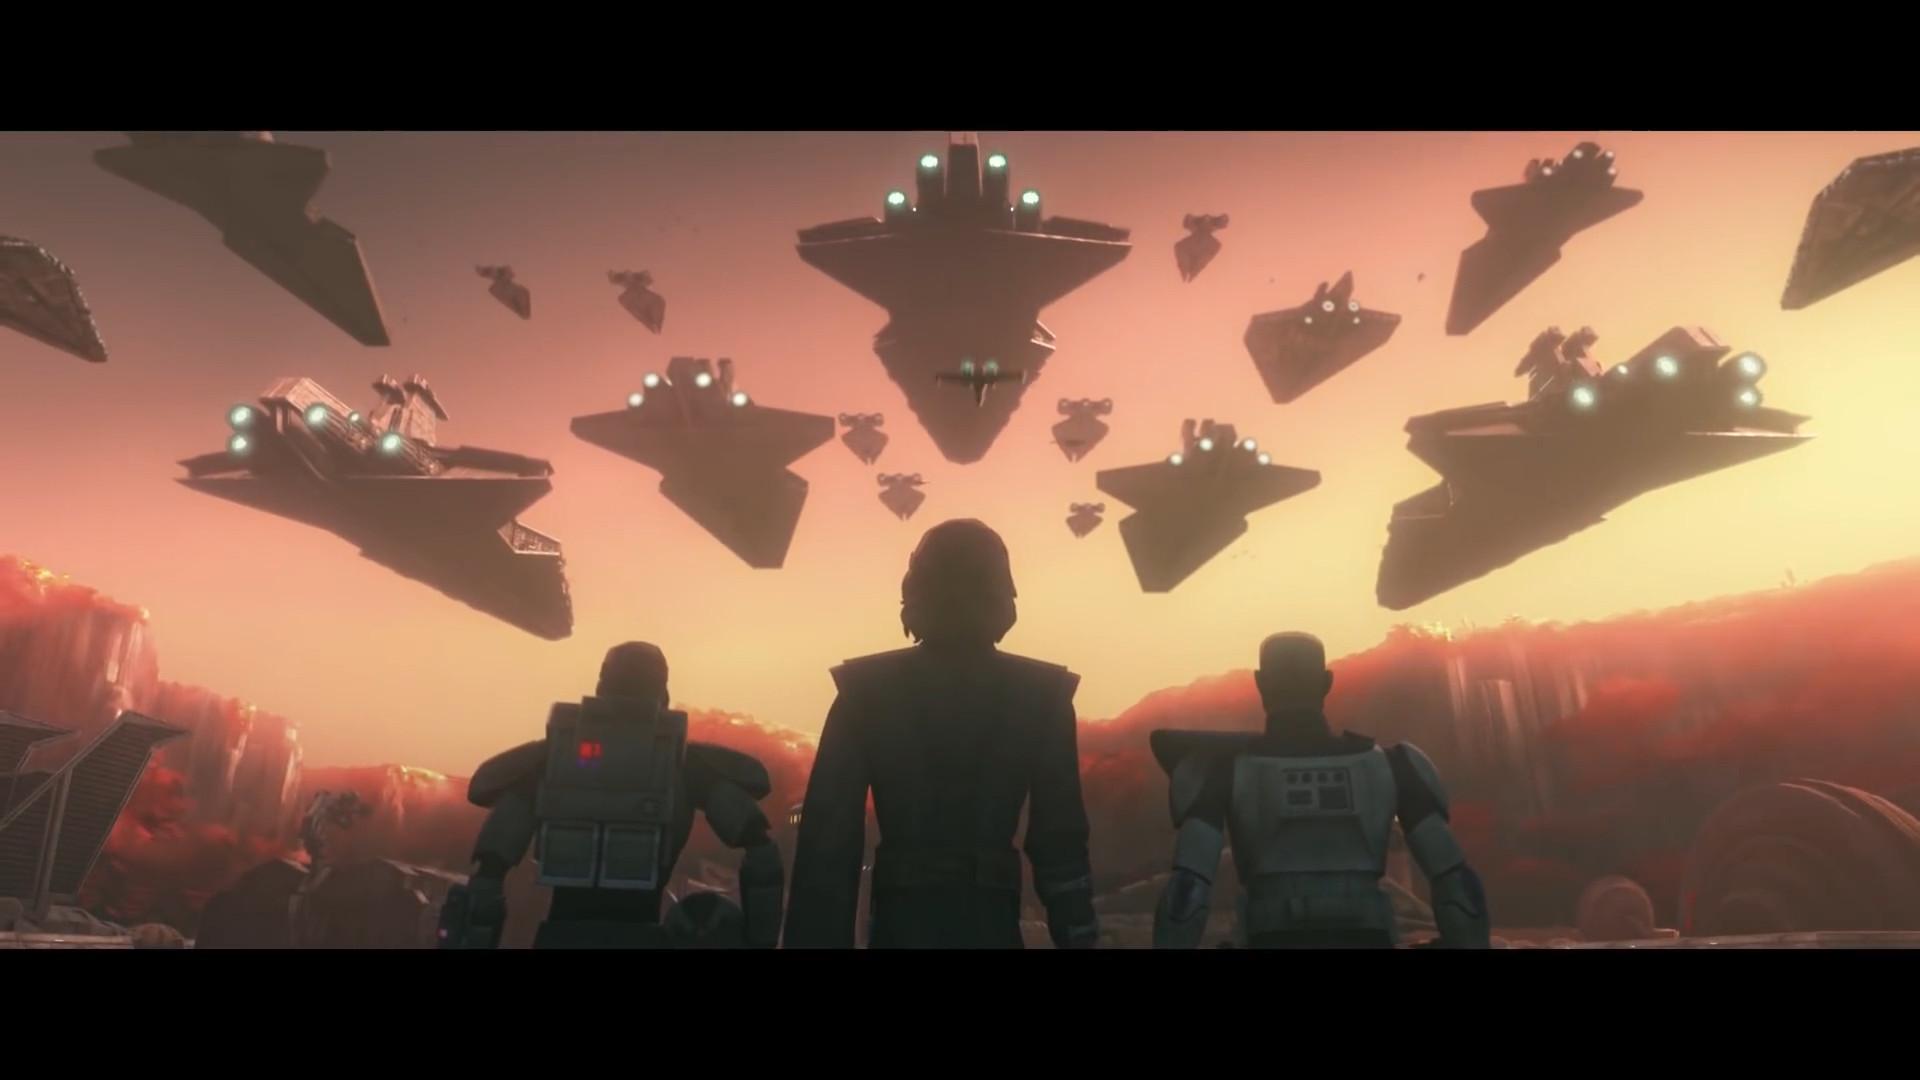 clone-wars-saved-trailer-02